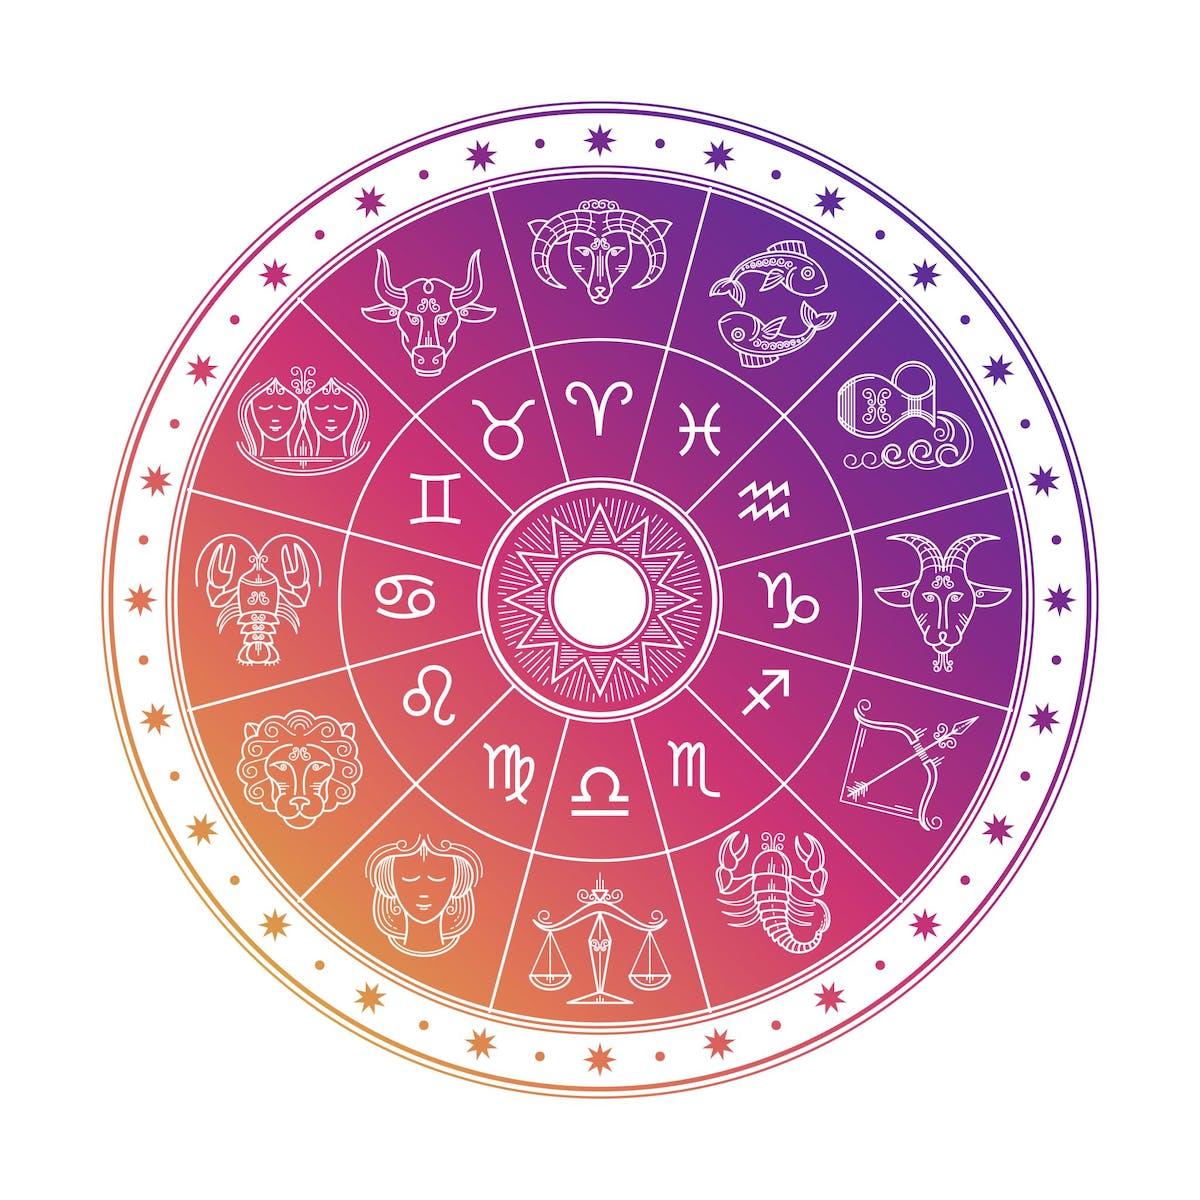 Mercury in Retrograde: Millennial women, astrology and